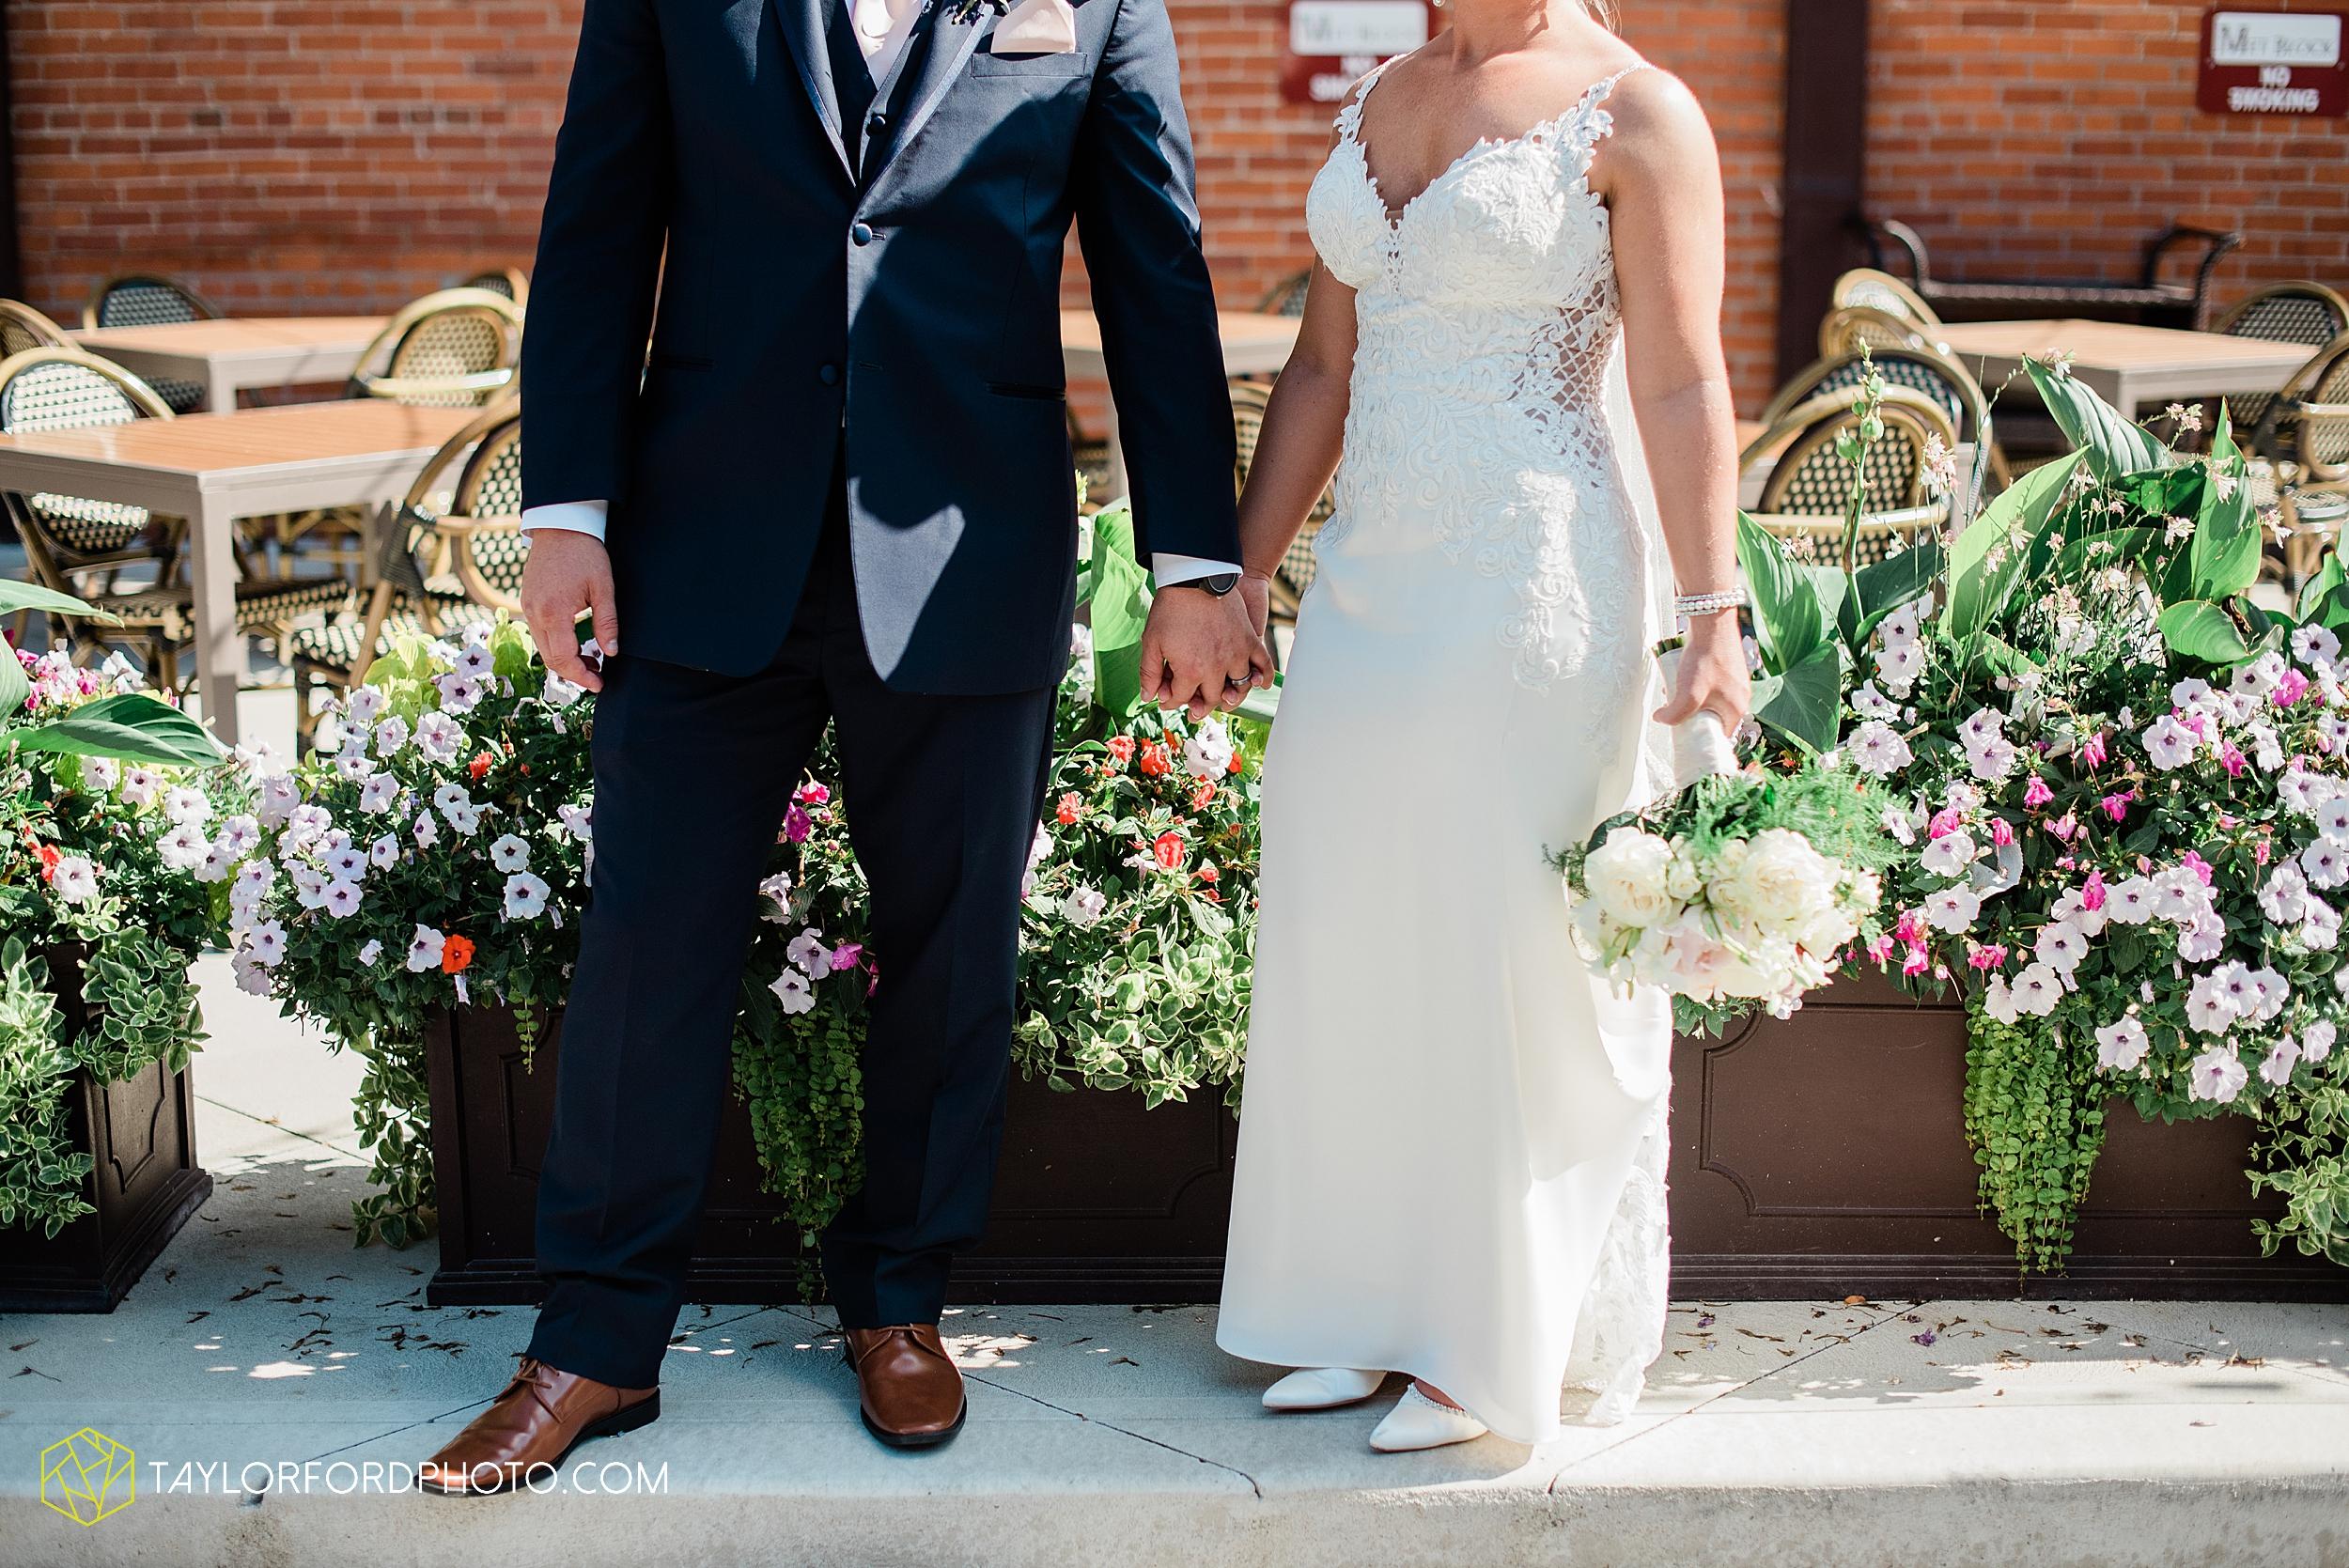 carly-trent-lima-elida-ohio-wedding-the-met-civic-center-reception-immanuel-united-methodist-church-photography-taylor-ford-hirschy-photographer_3357.jpg